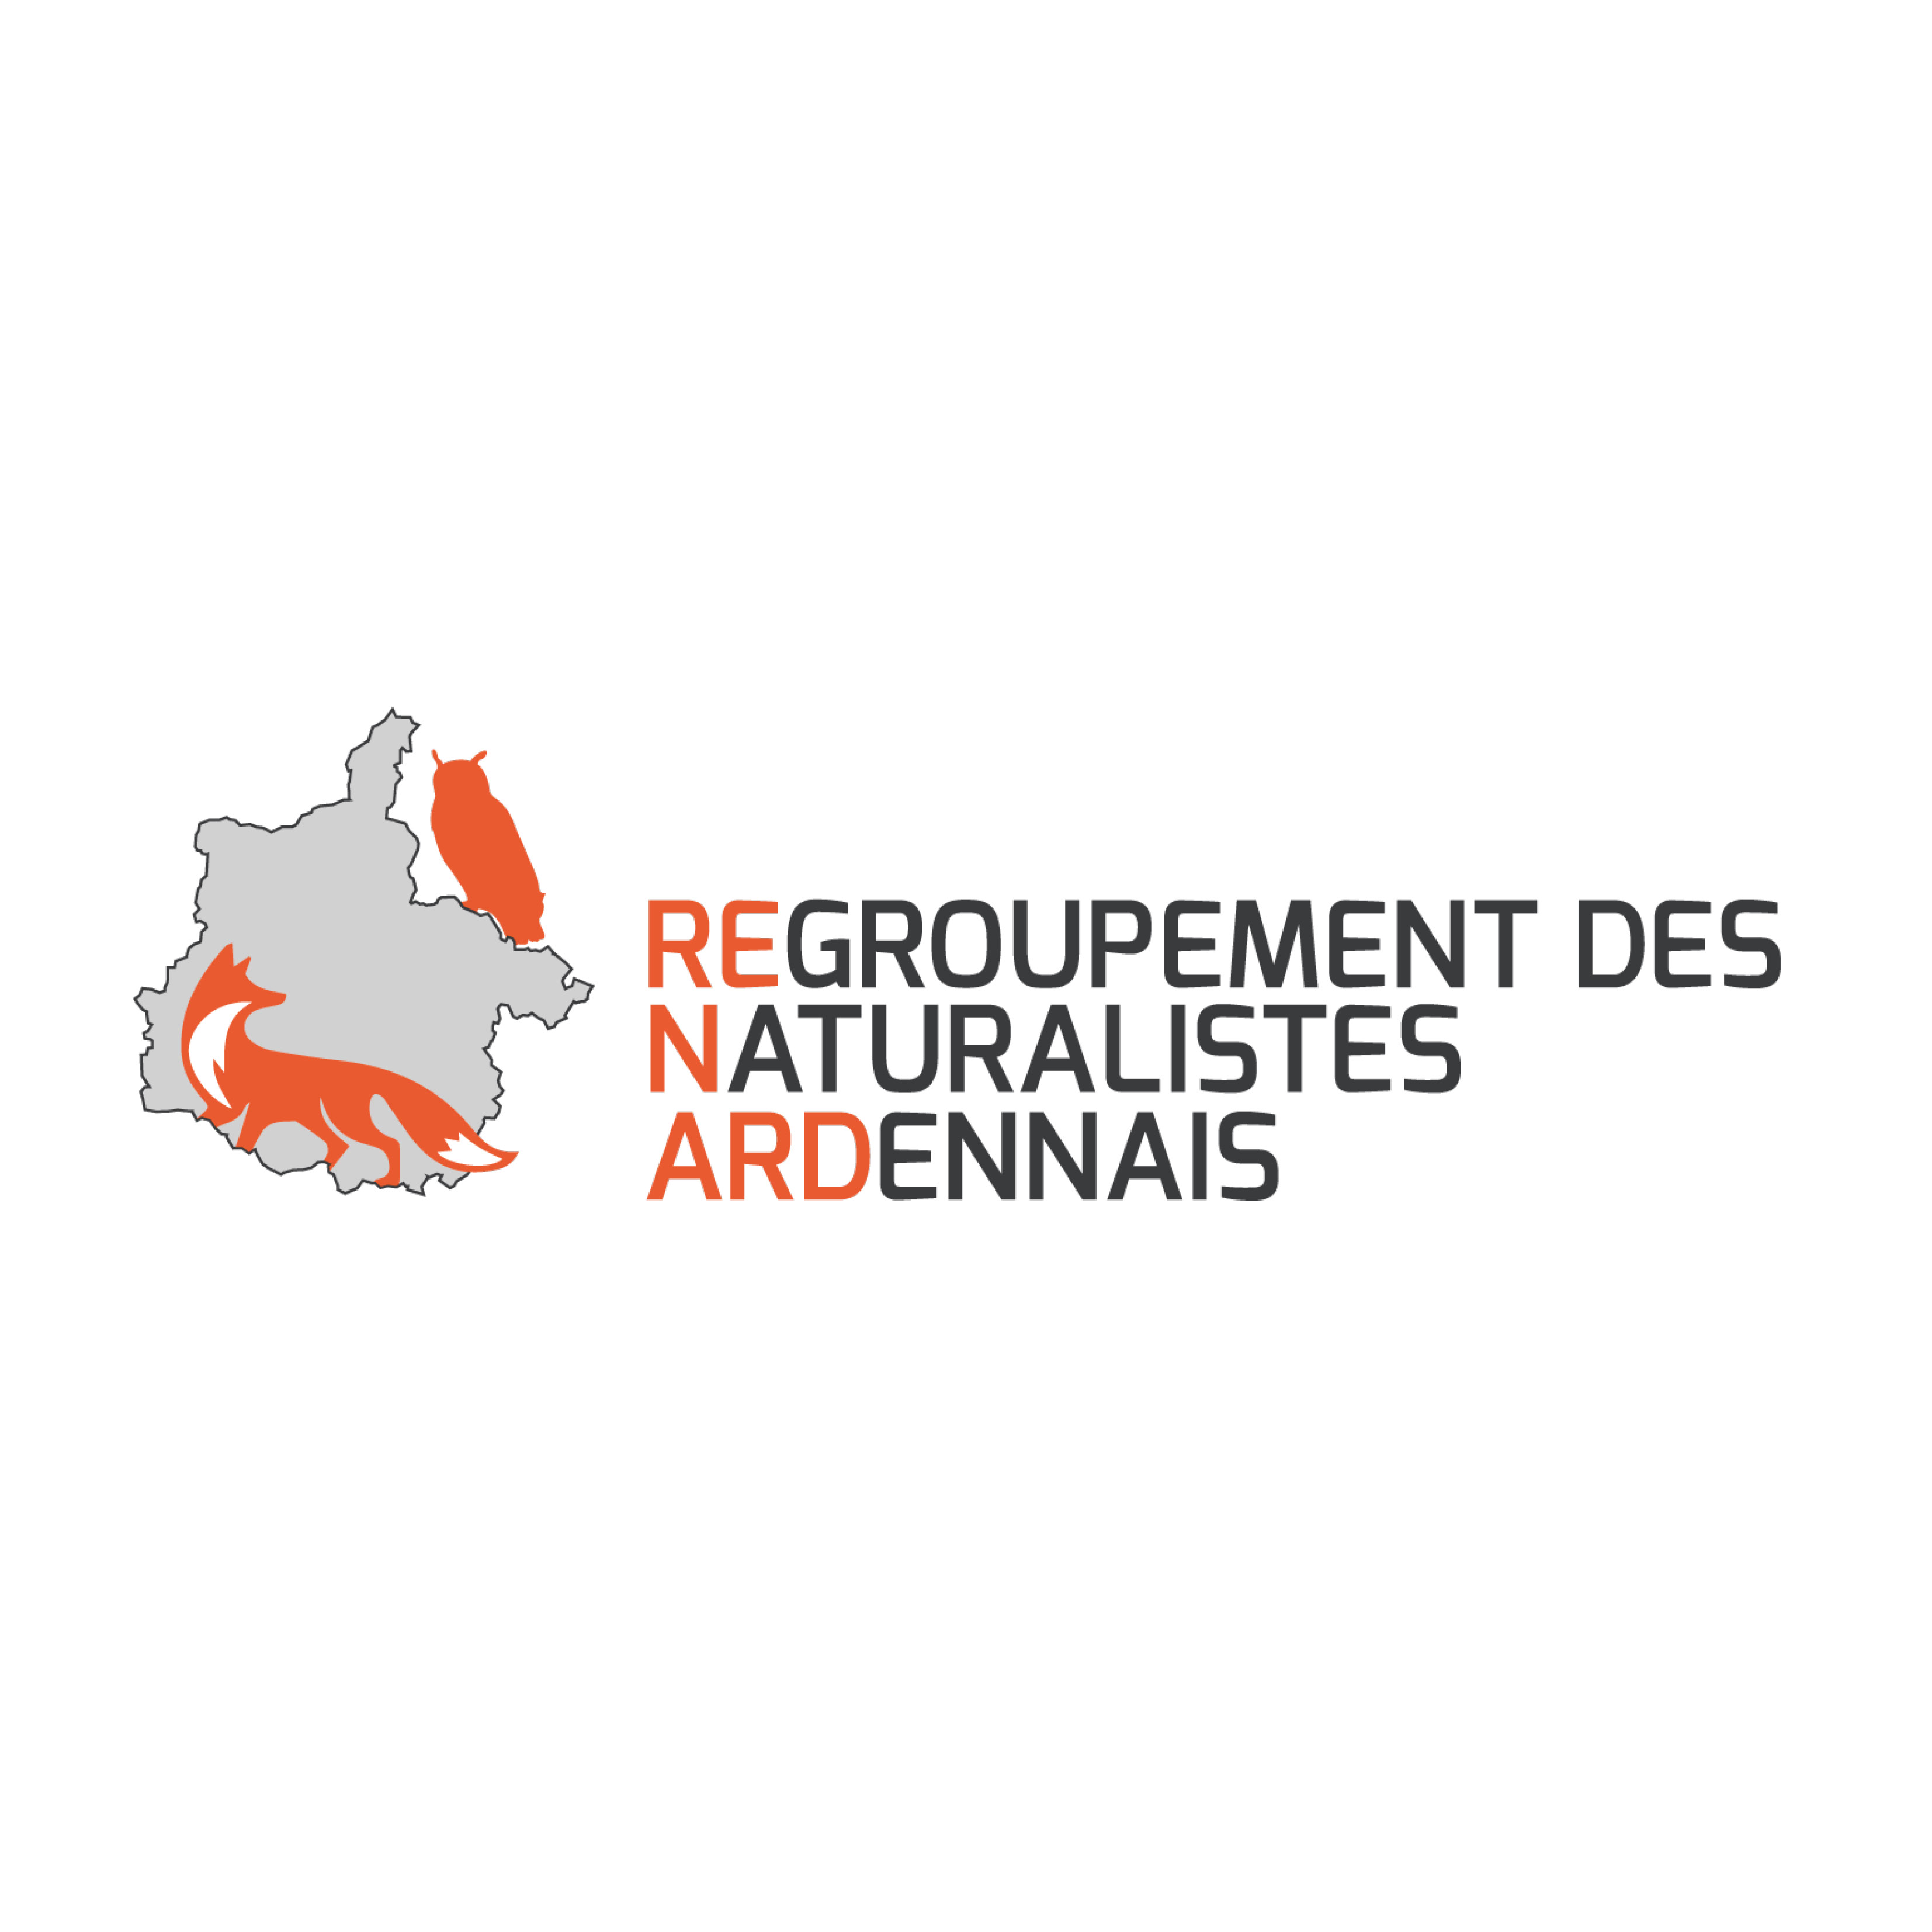 REgroupement des NAturalistes ARDennais (RENARD)